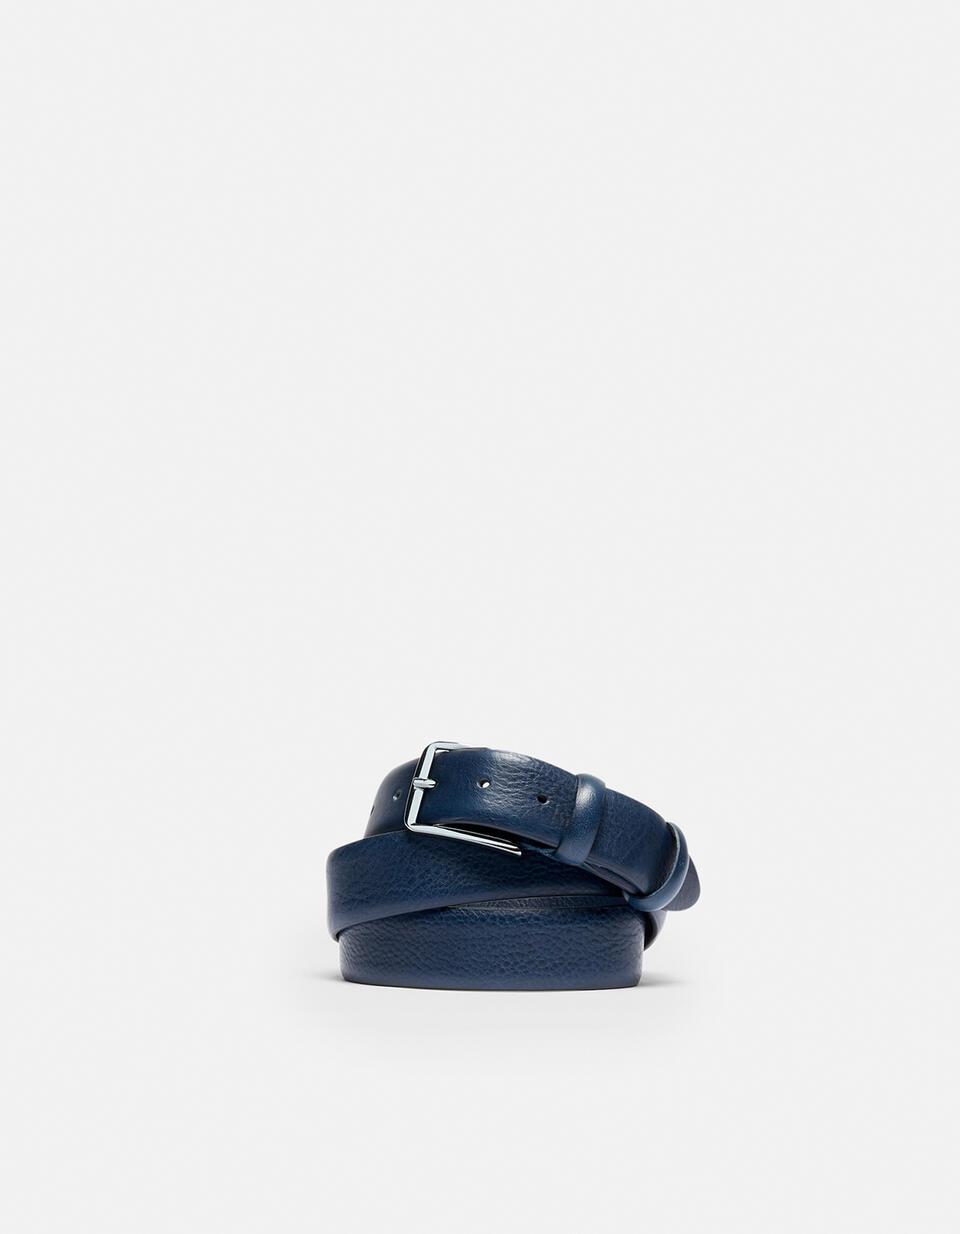 Cintura Classica in pelle con cucitura a contrasto  Cuoieria Fiorentina